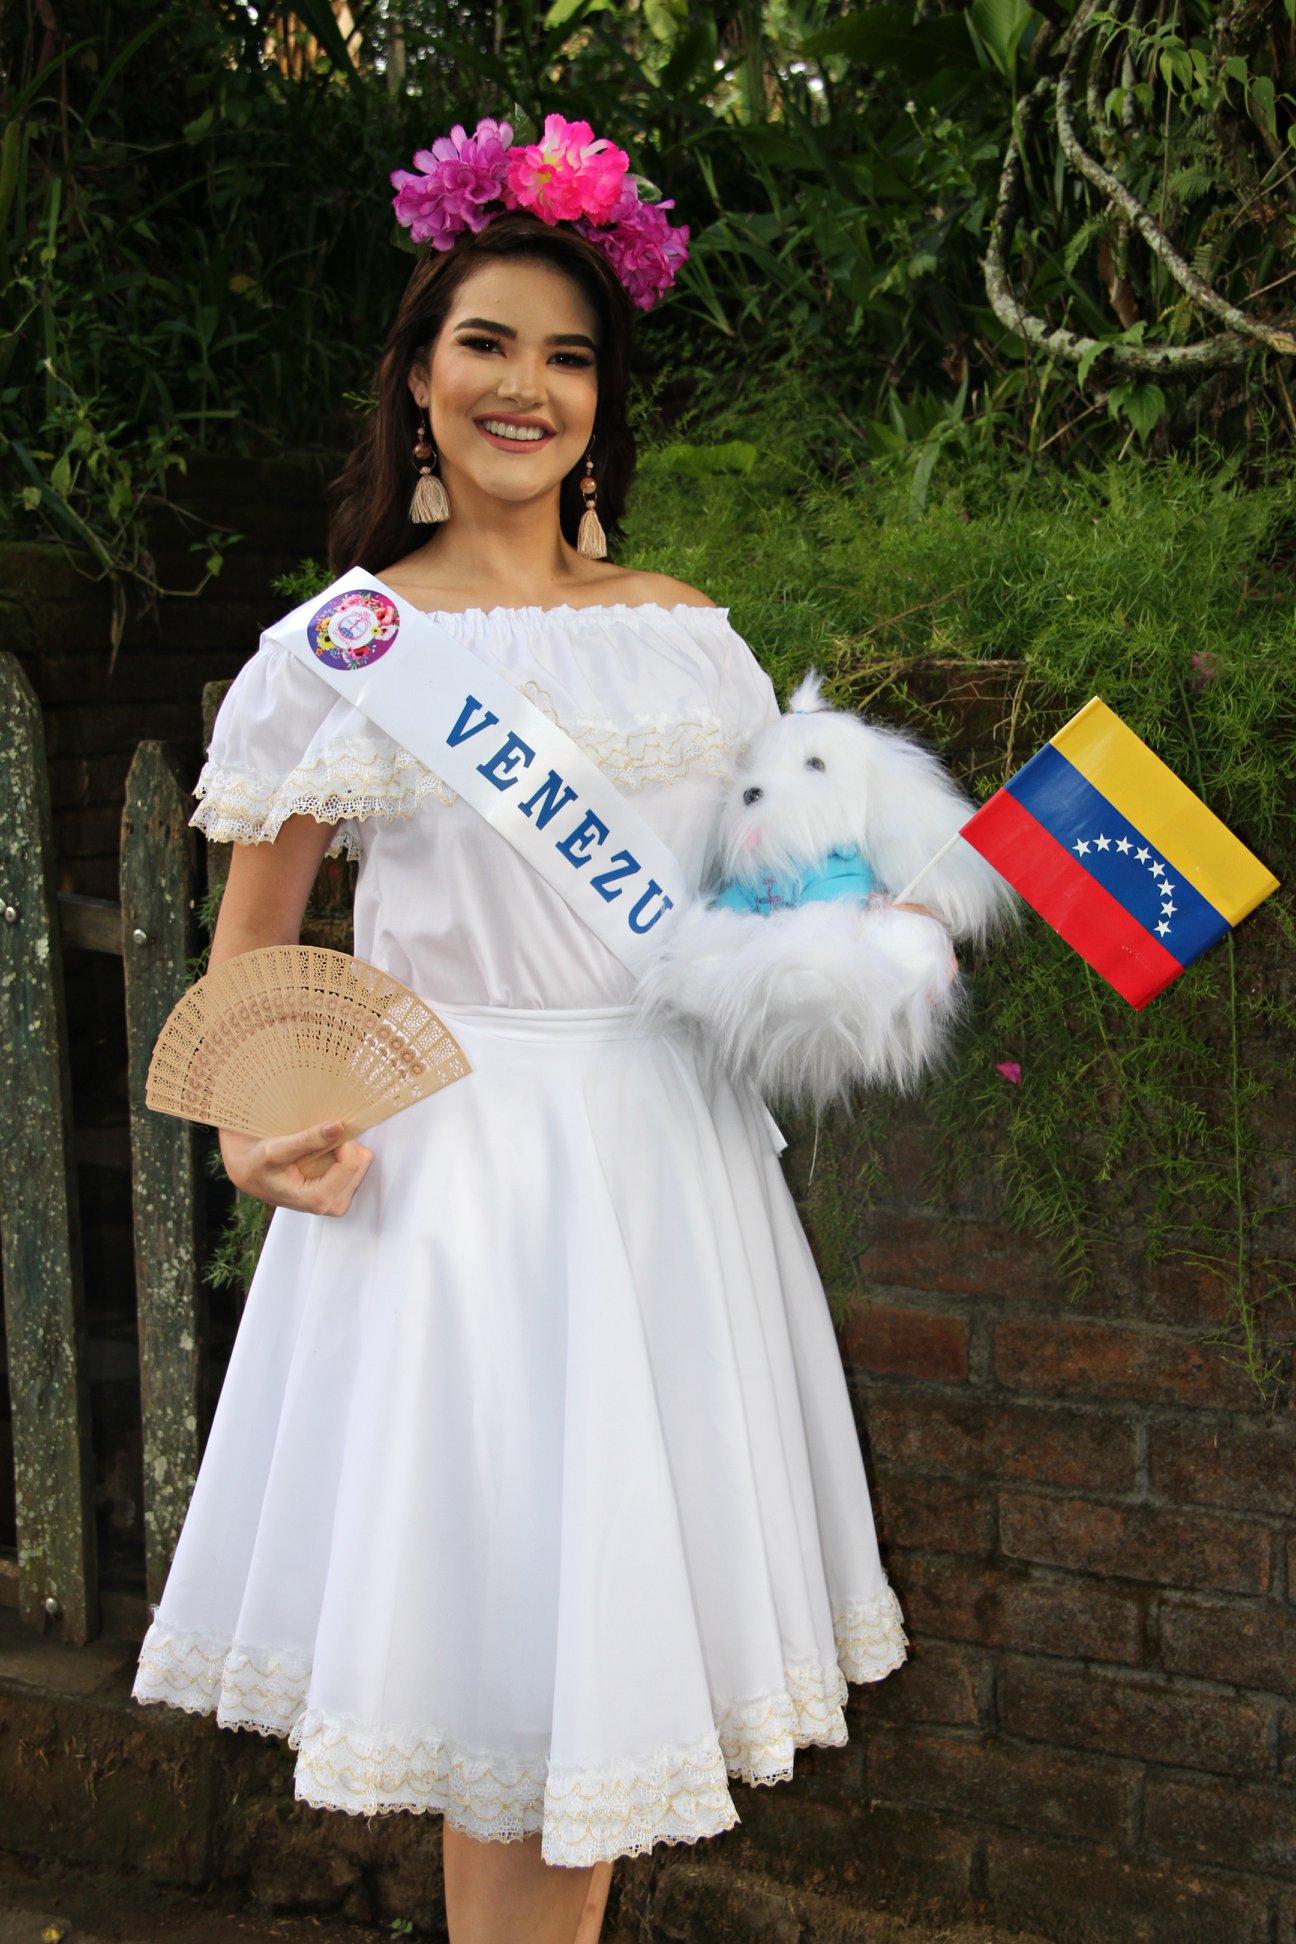 daniela di venere, top 12 de miss teen mundial 2019. - Página 3 60602410